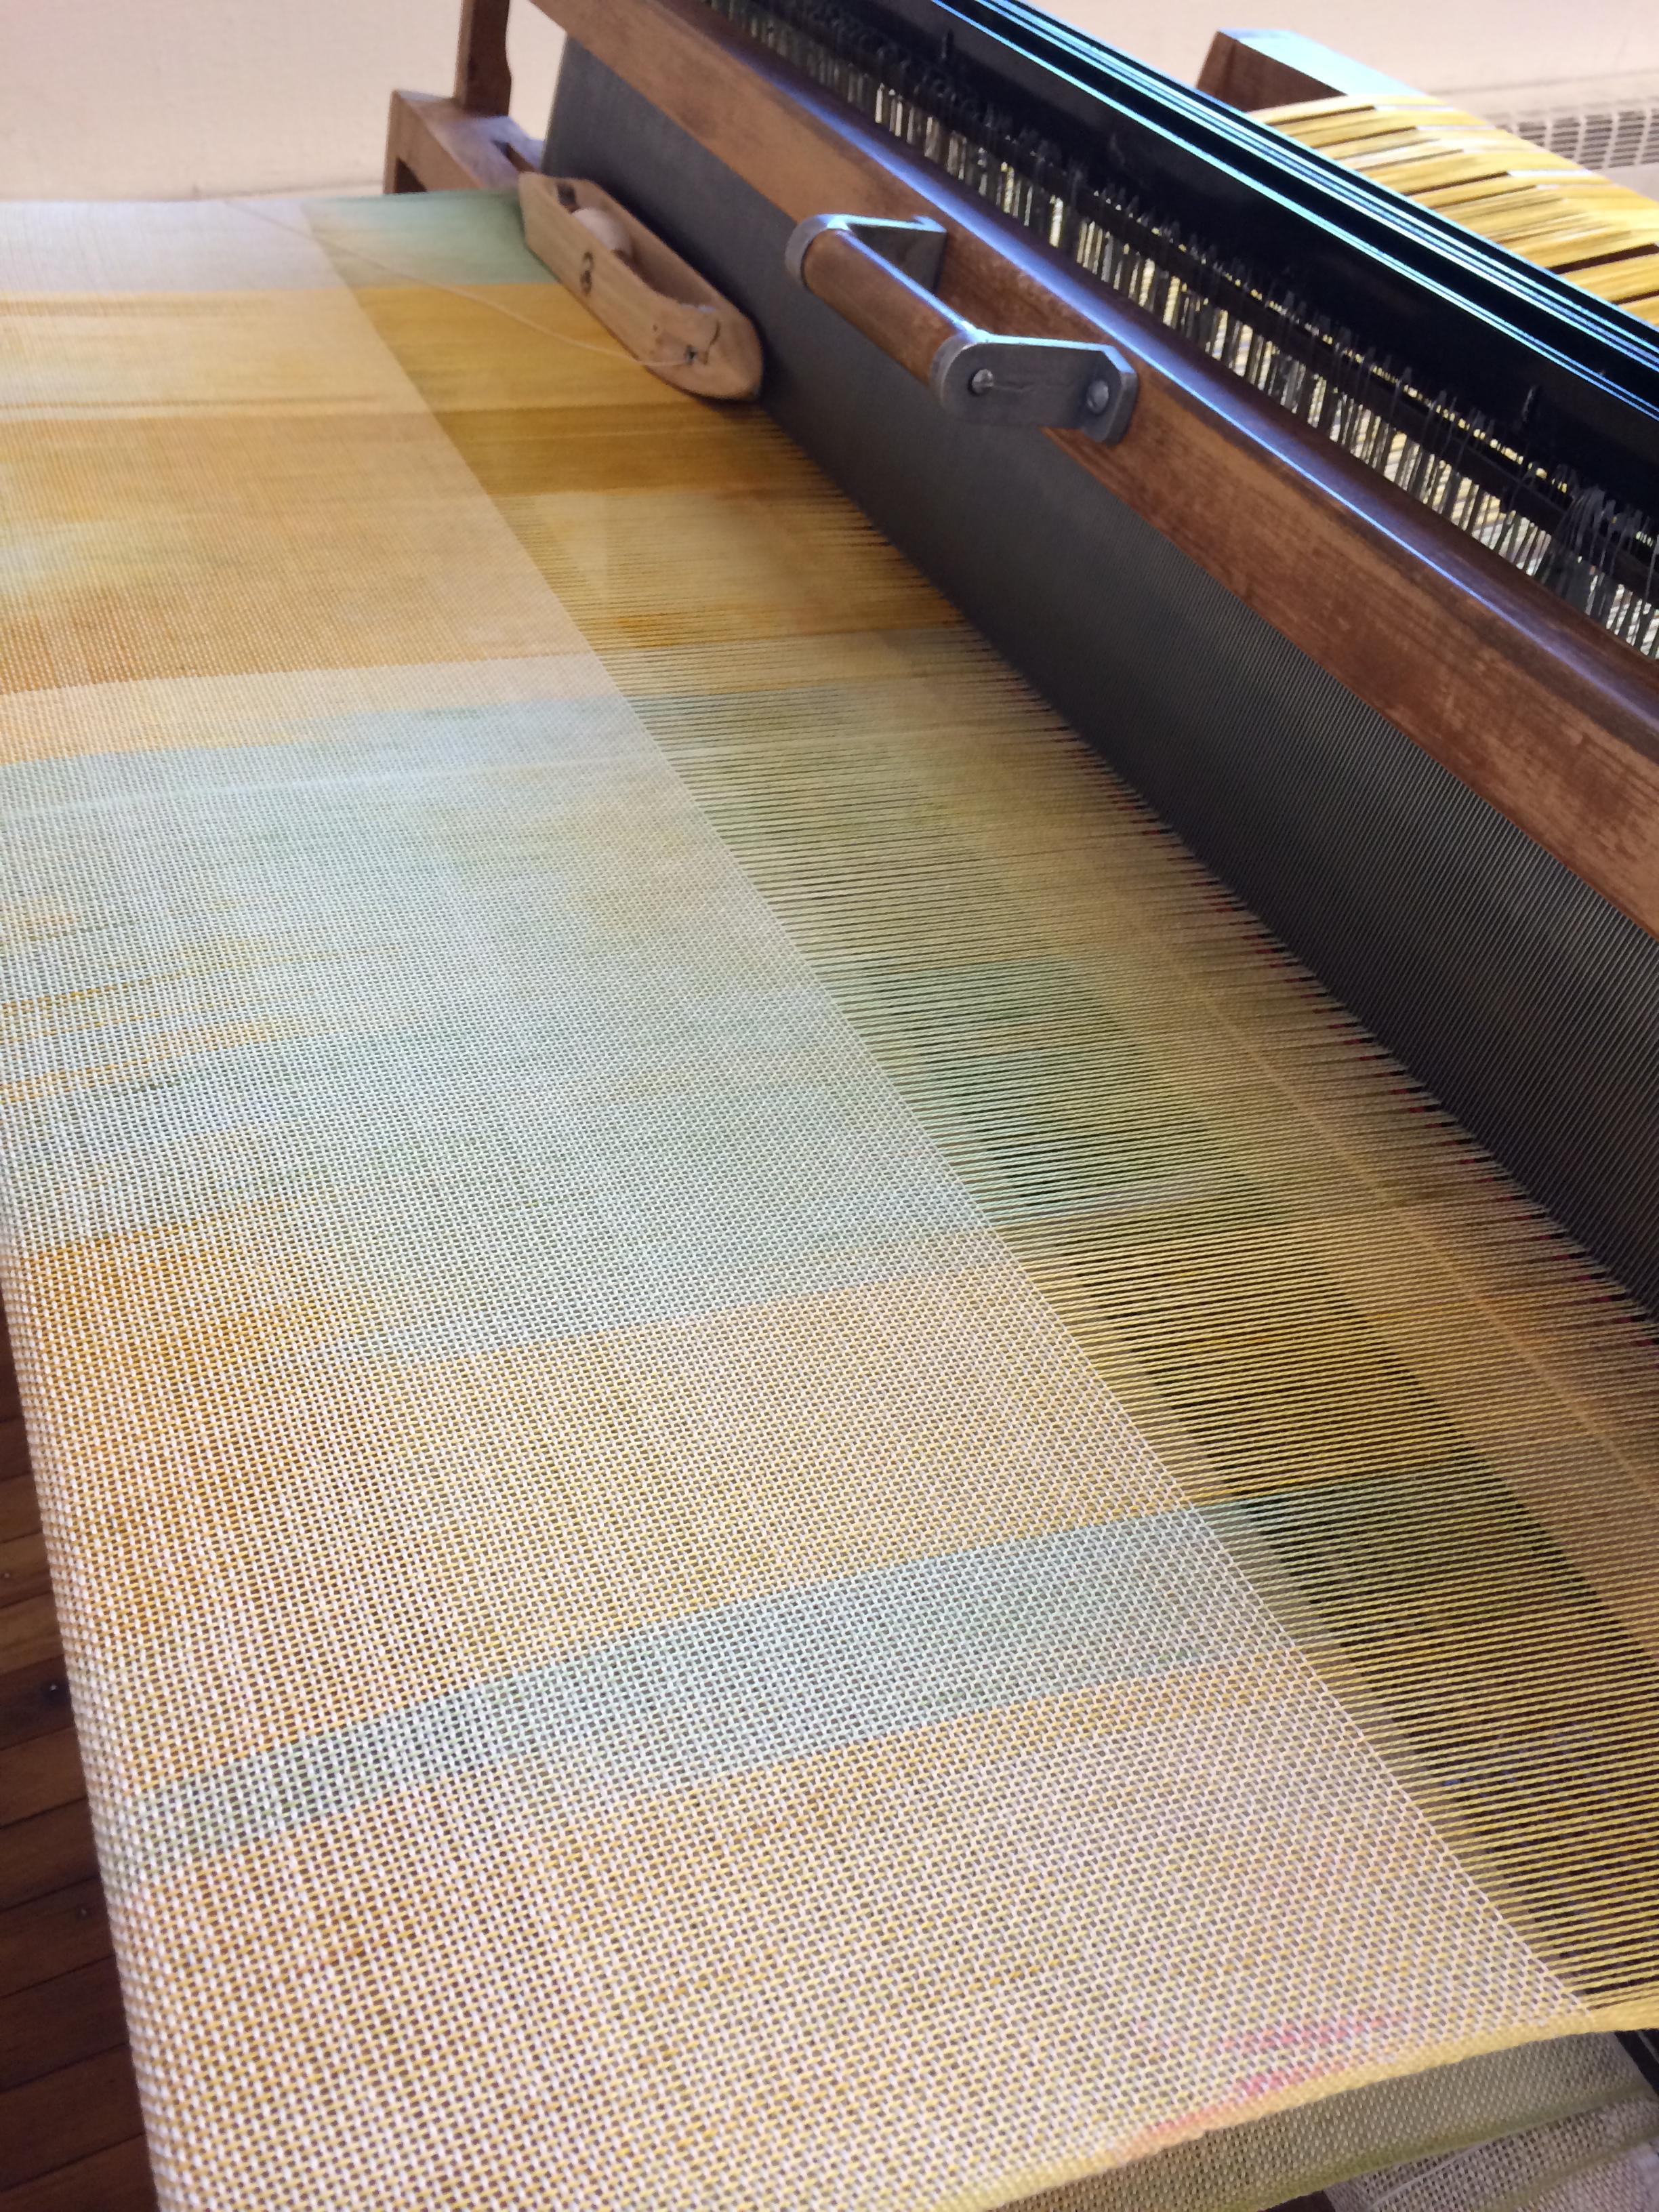 Process shot while weaving, its coming along